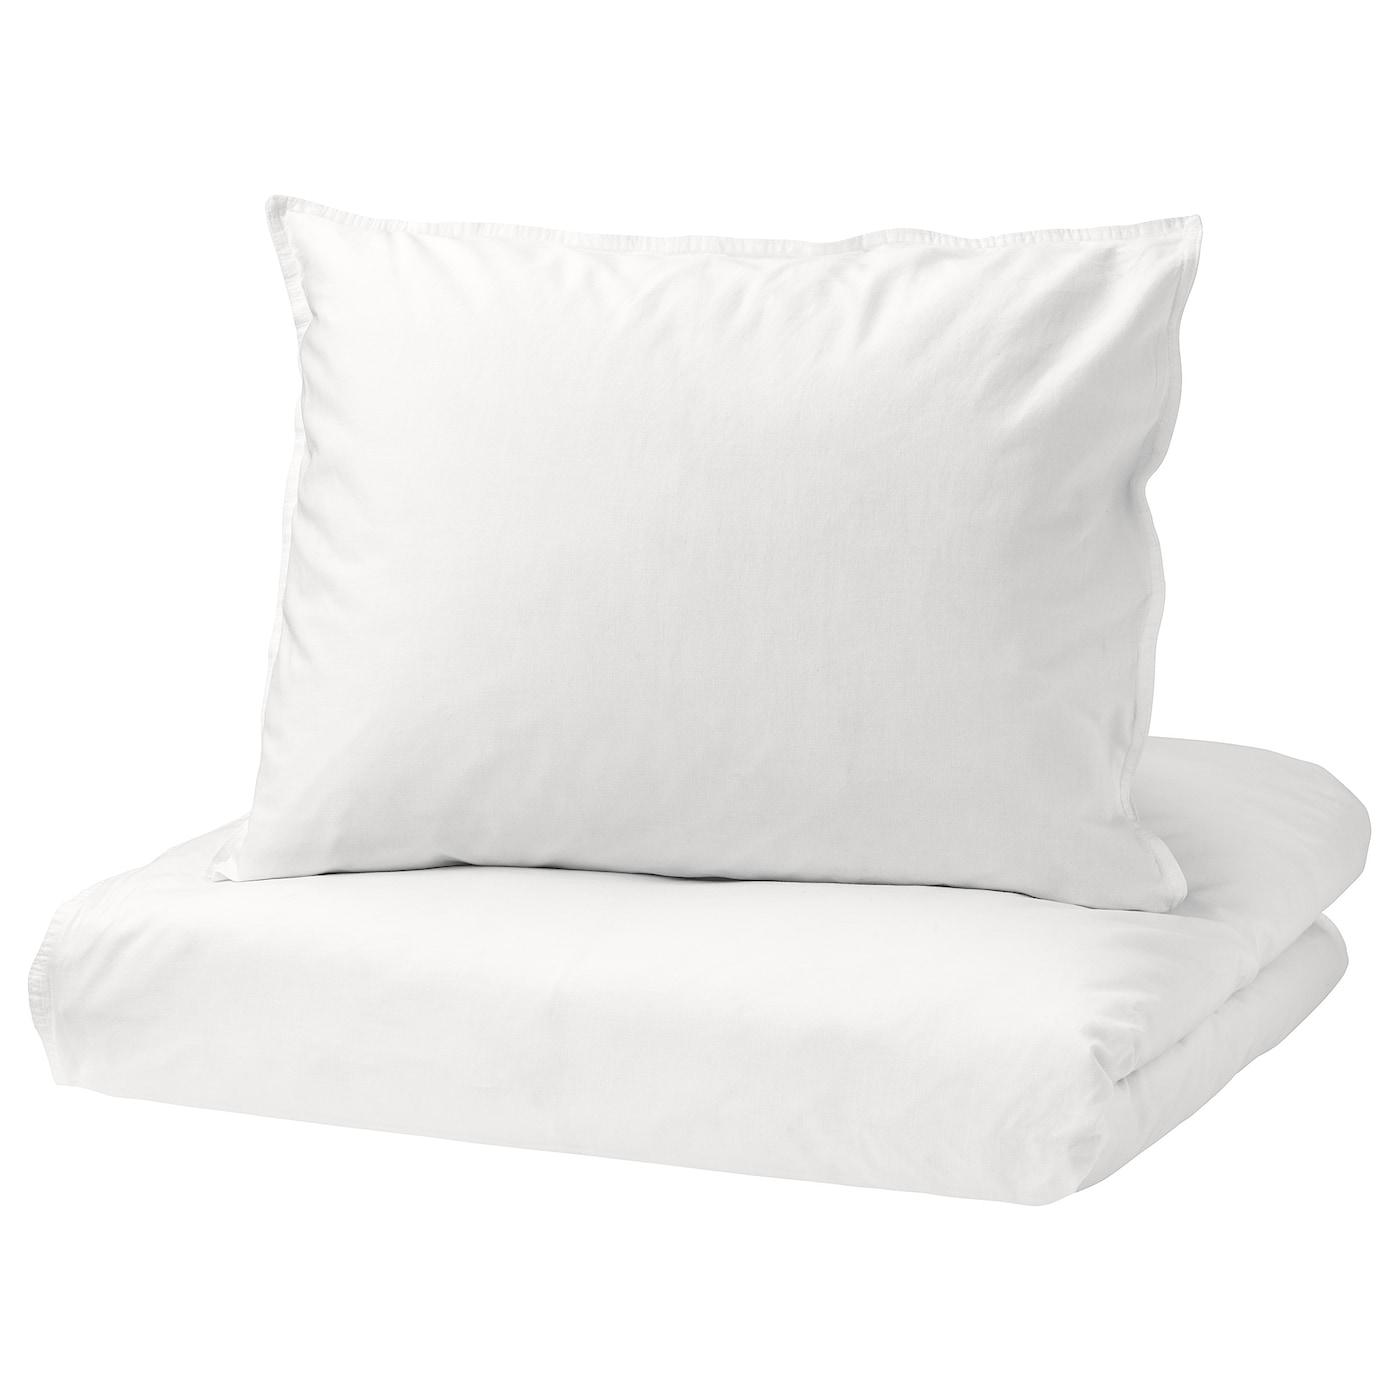 sk gg rt coussin noir blanc 30 x 60 cm ikea. Black Bedroom Furniture Sets. Home Design Ideas